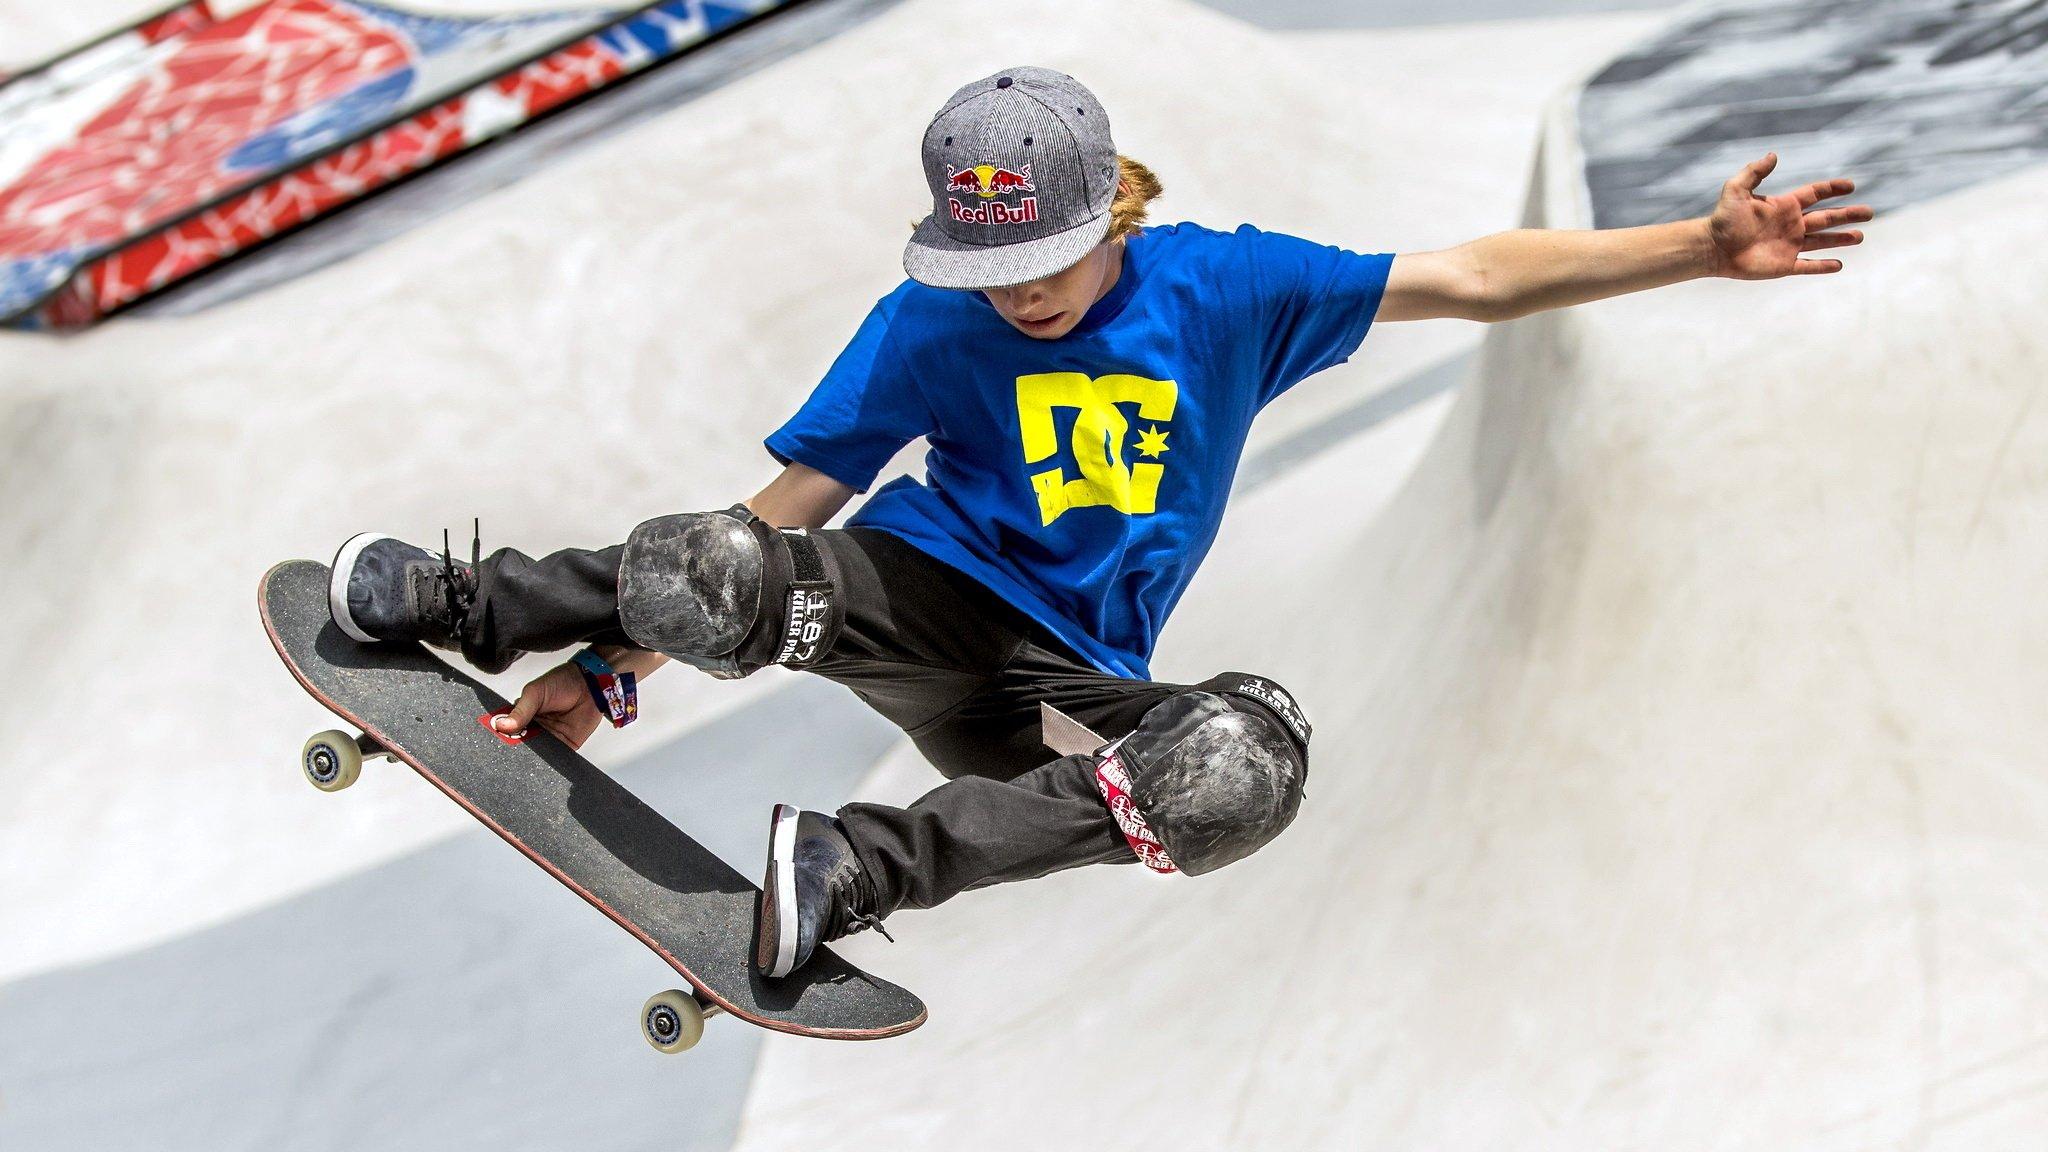 skateboard wallpaper